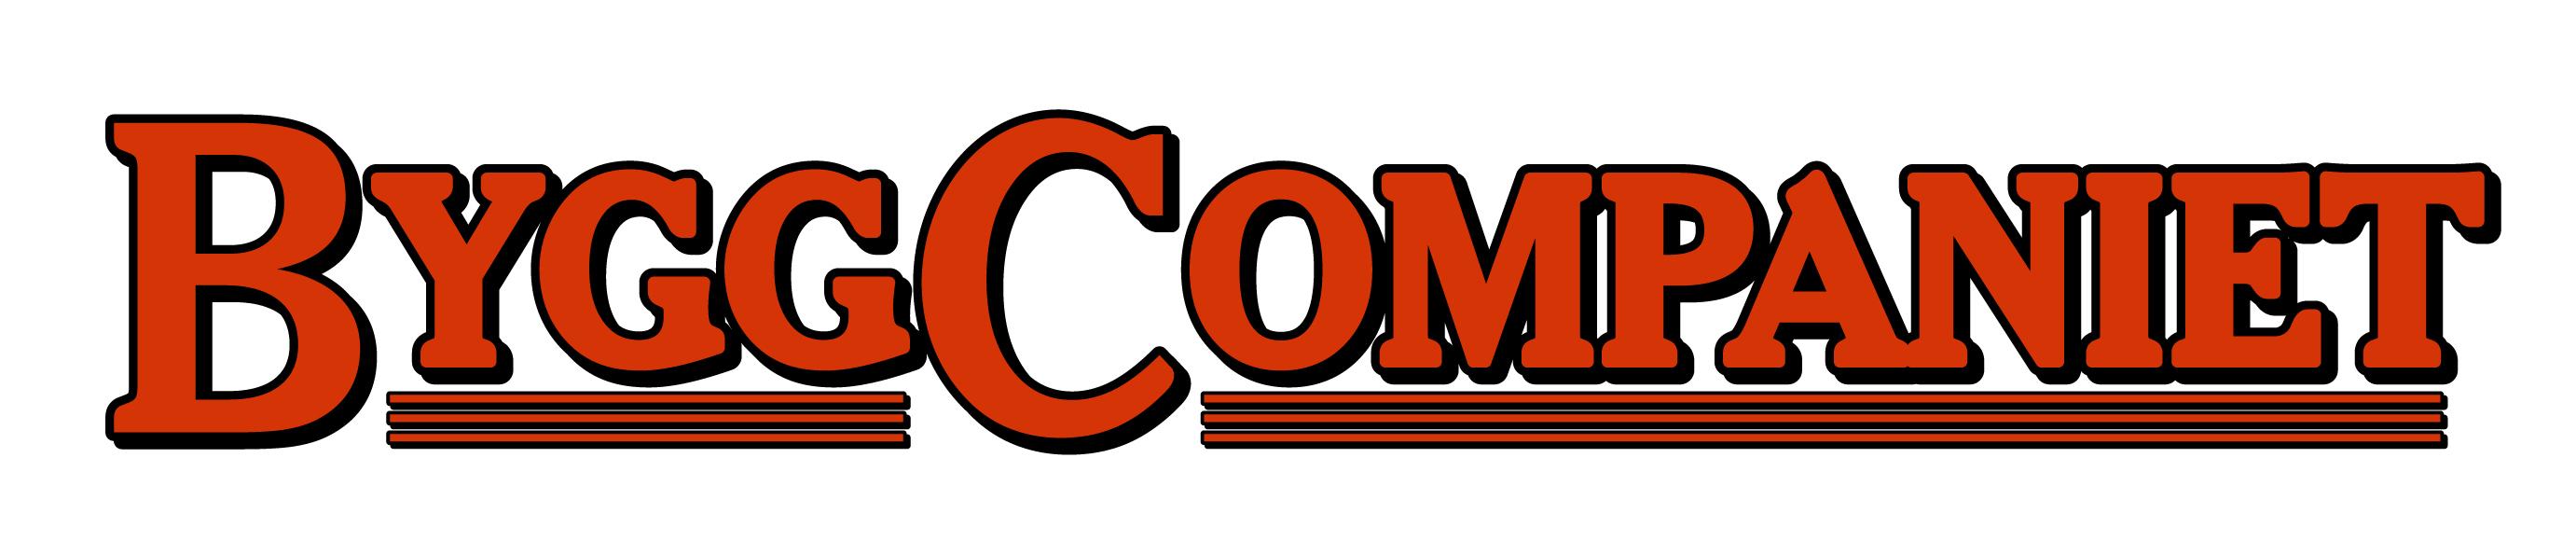 logotyp ByggCompaniet AB